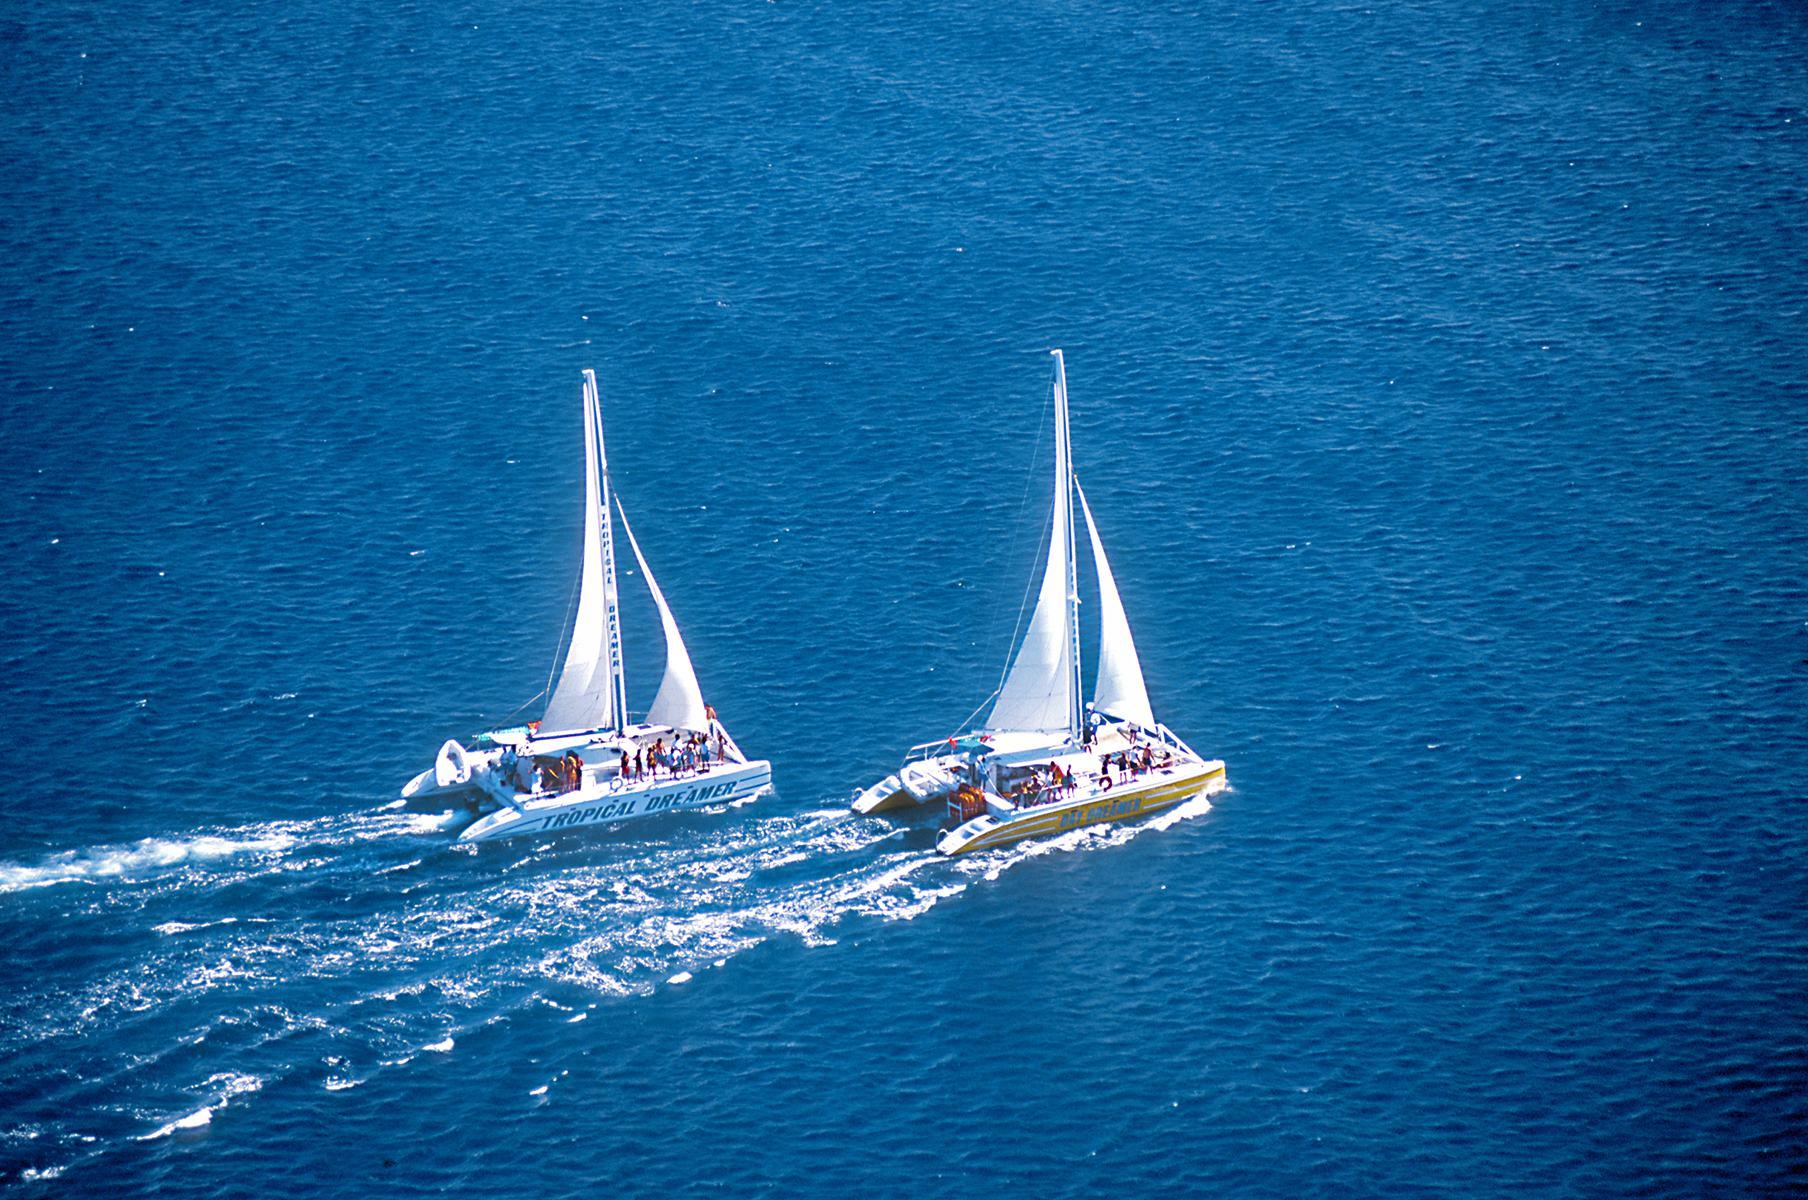 Negril Beach & Catamaran Cruise with Ricks Cafe on